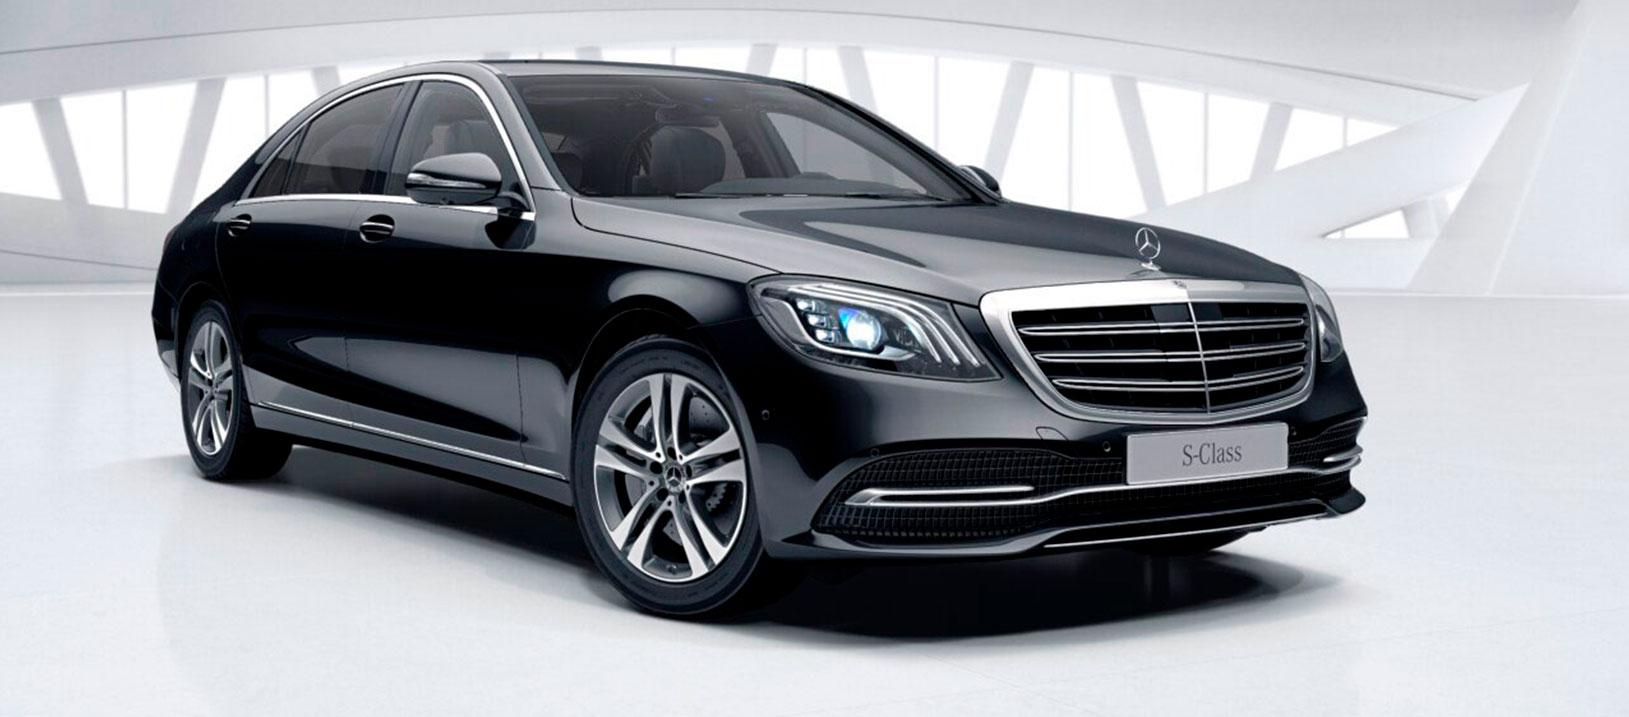 Mercedes-Benz S 350 d 4MATIC long 52600224